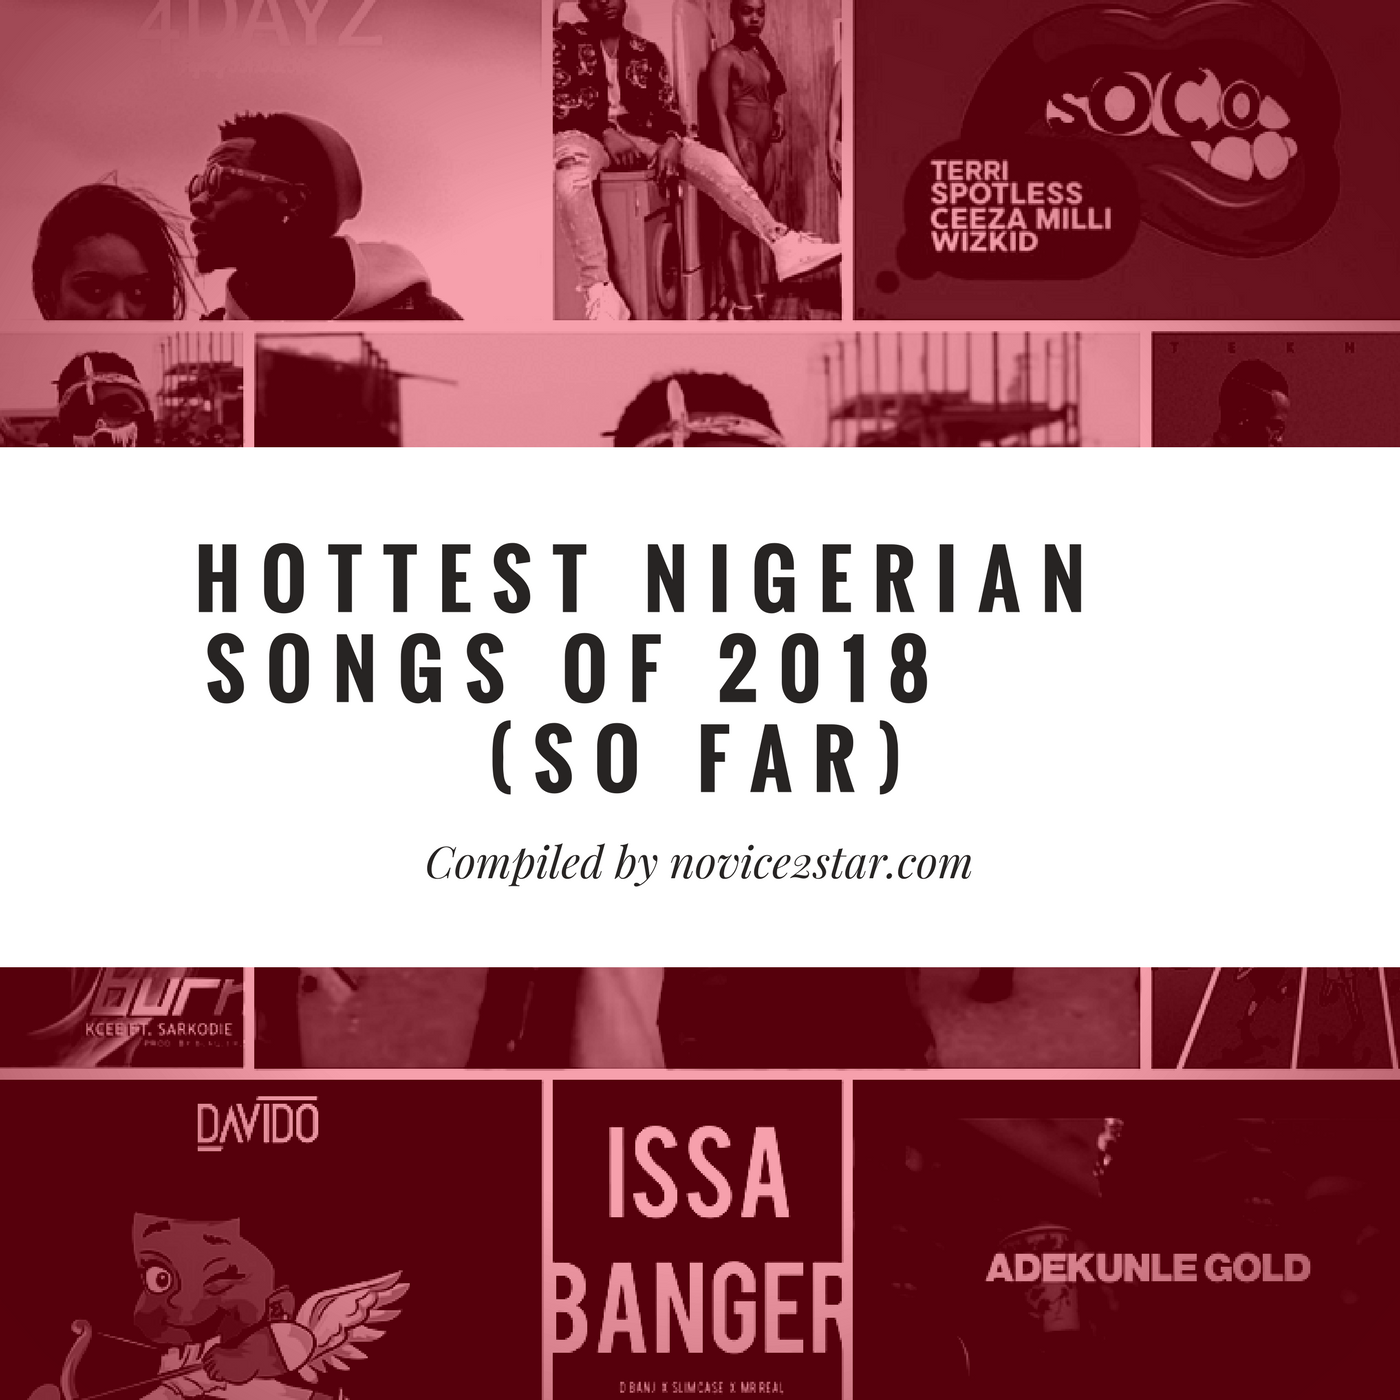 Hottest Nigerian Songs Of 2018 So Far